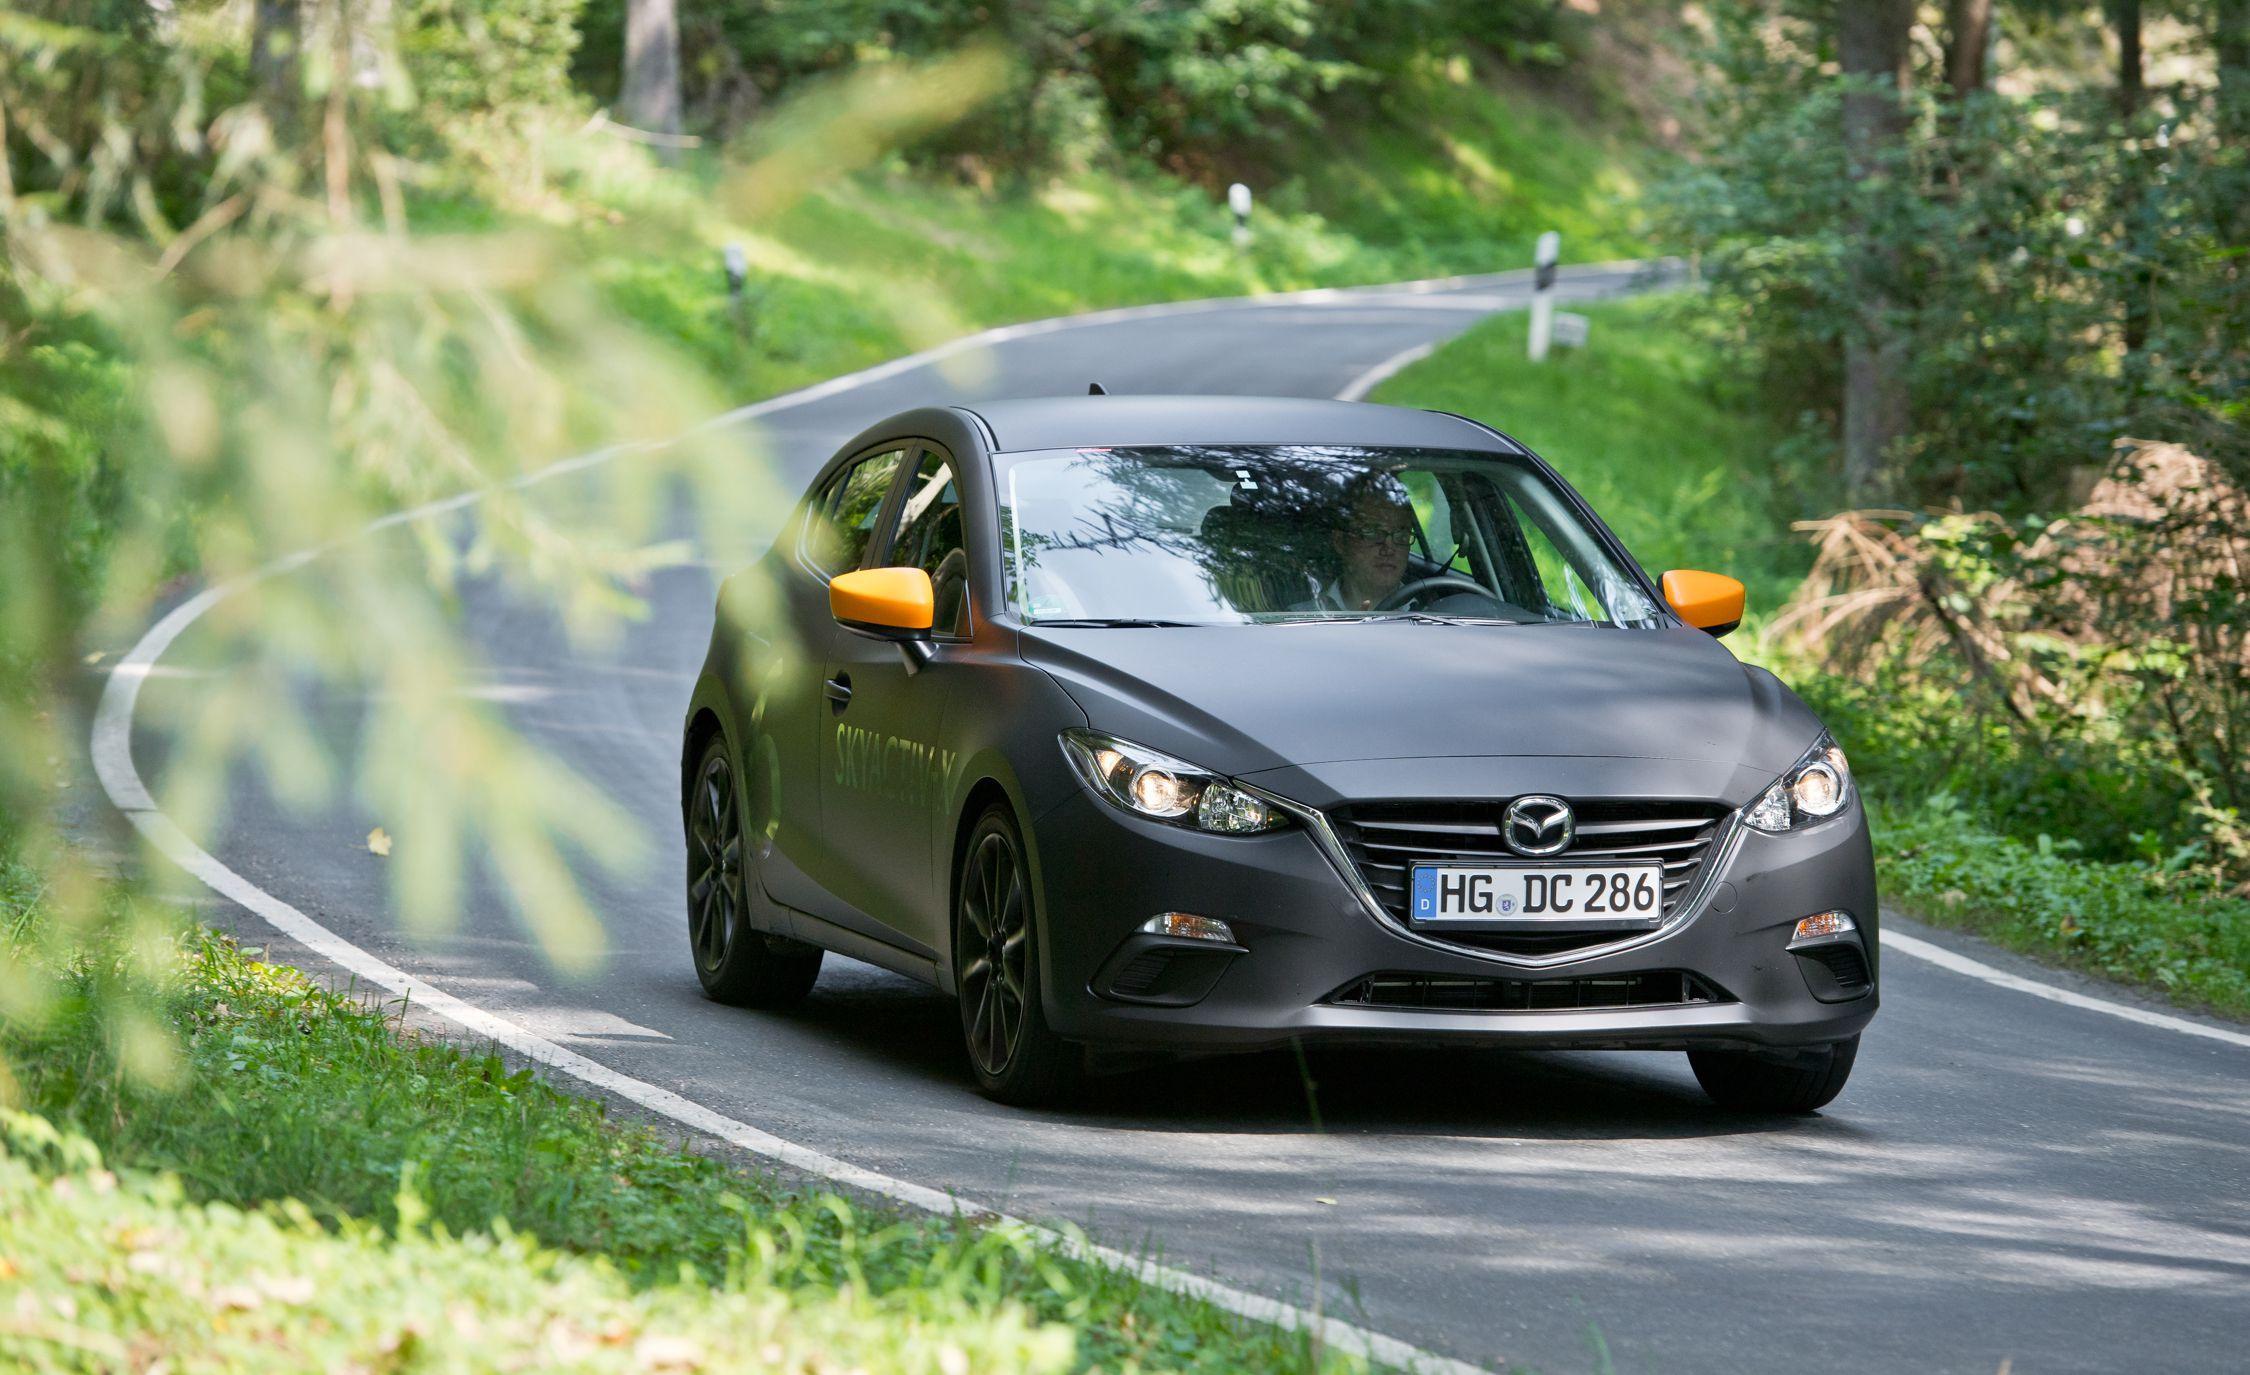 2019 Mazda 3 Photo Gallery